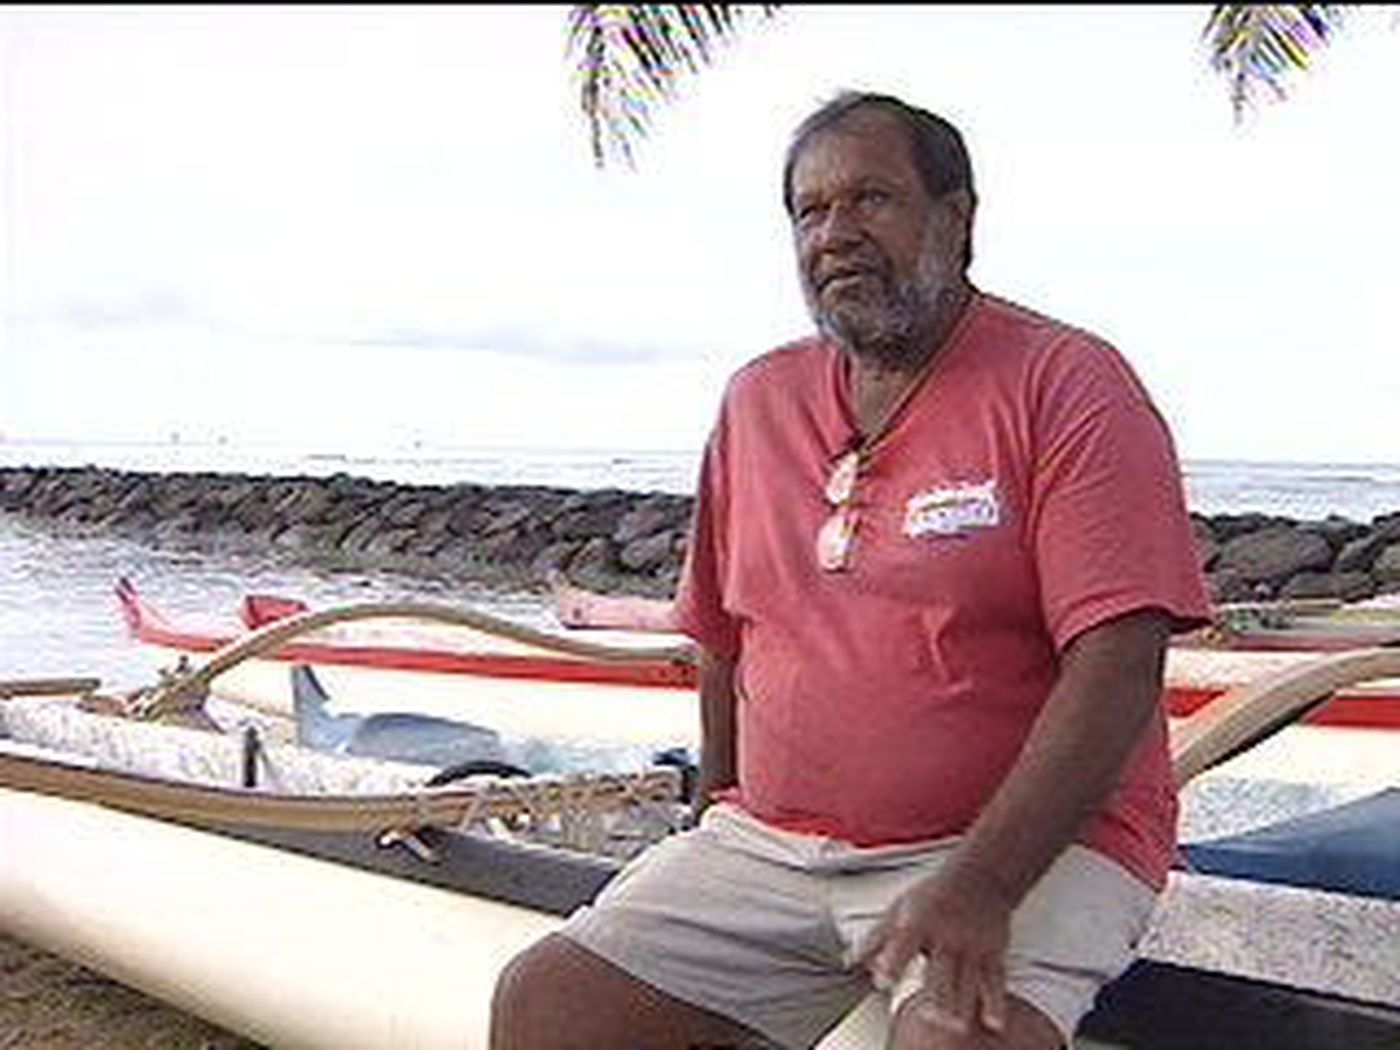 Legendary Island Paddler Ready to Make New Mark at Molokai Hoe 1400x1050